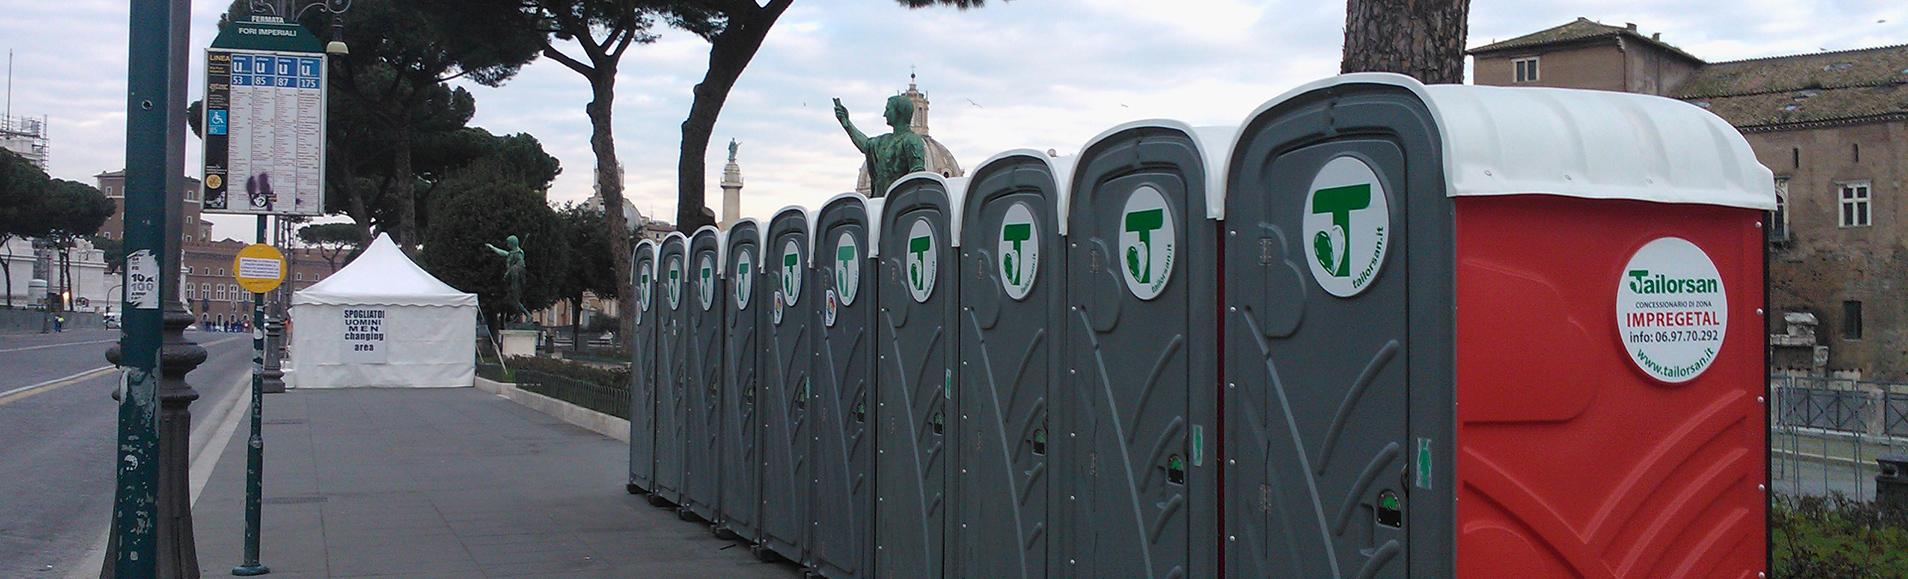 Slide bagni chimici maratona di roma tailorsan noleggio wc chimici - Noleggio bagni chimici firenze ...